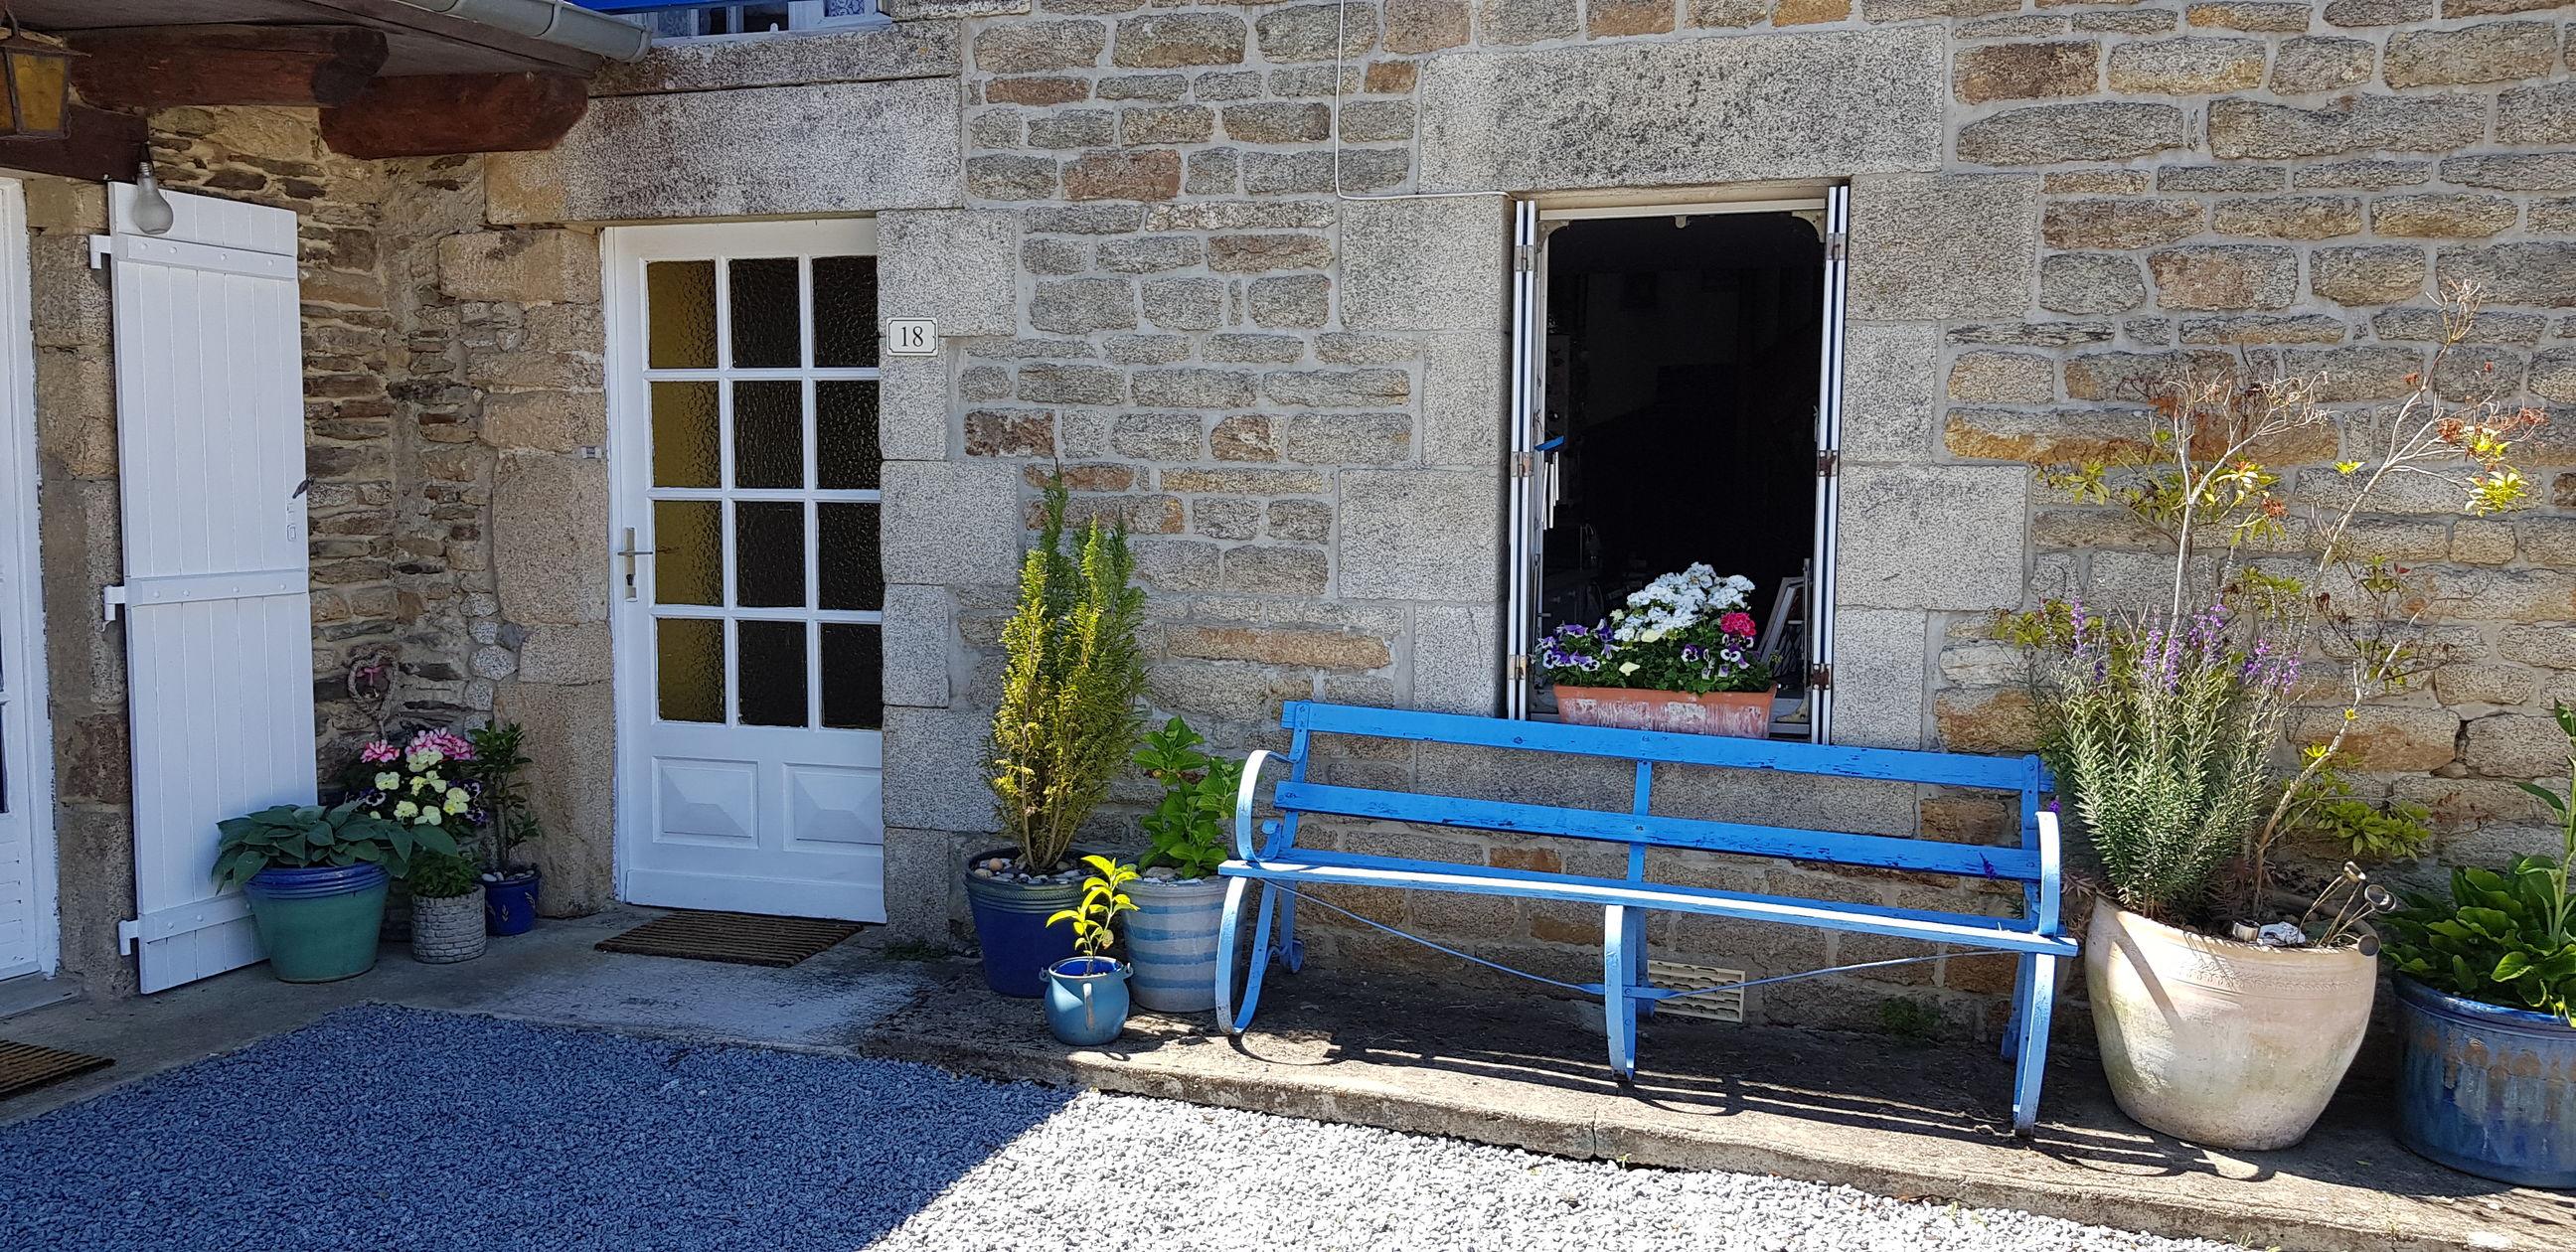 Maison D'Hortense